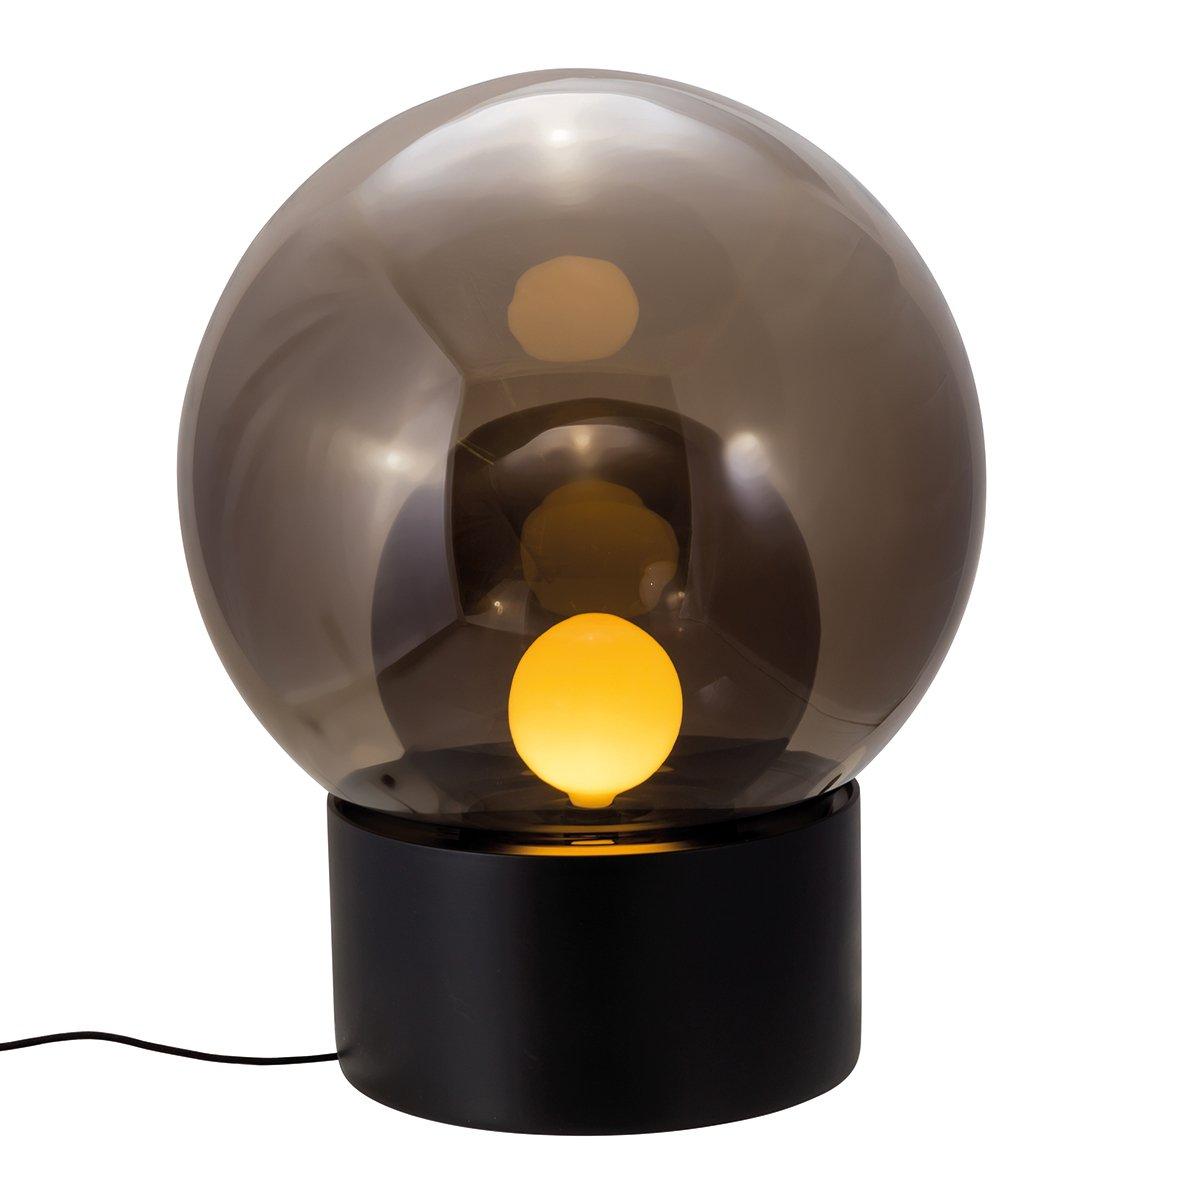 Pulpo Boule Medium Vloerlamp - Zwart - Smoke Grey